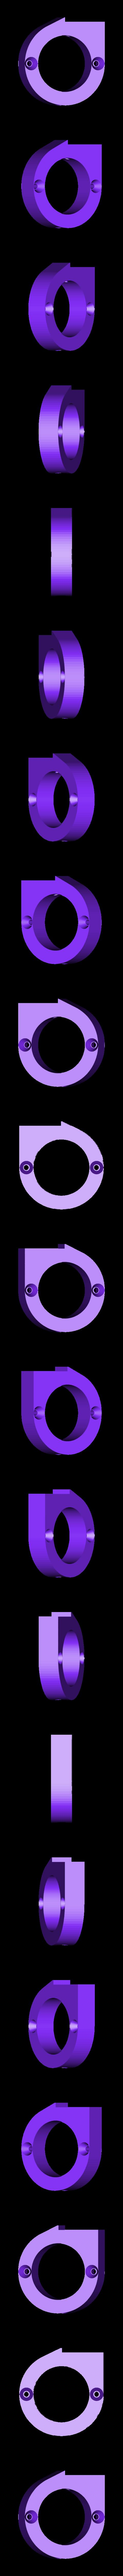 anneau.stl Download free STL file Tubes4shelves v1.0 • 3D printing model, KaptainPoiscaille